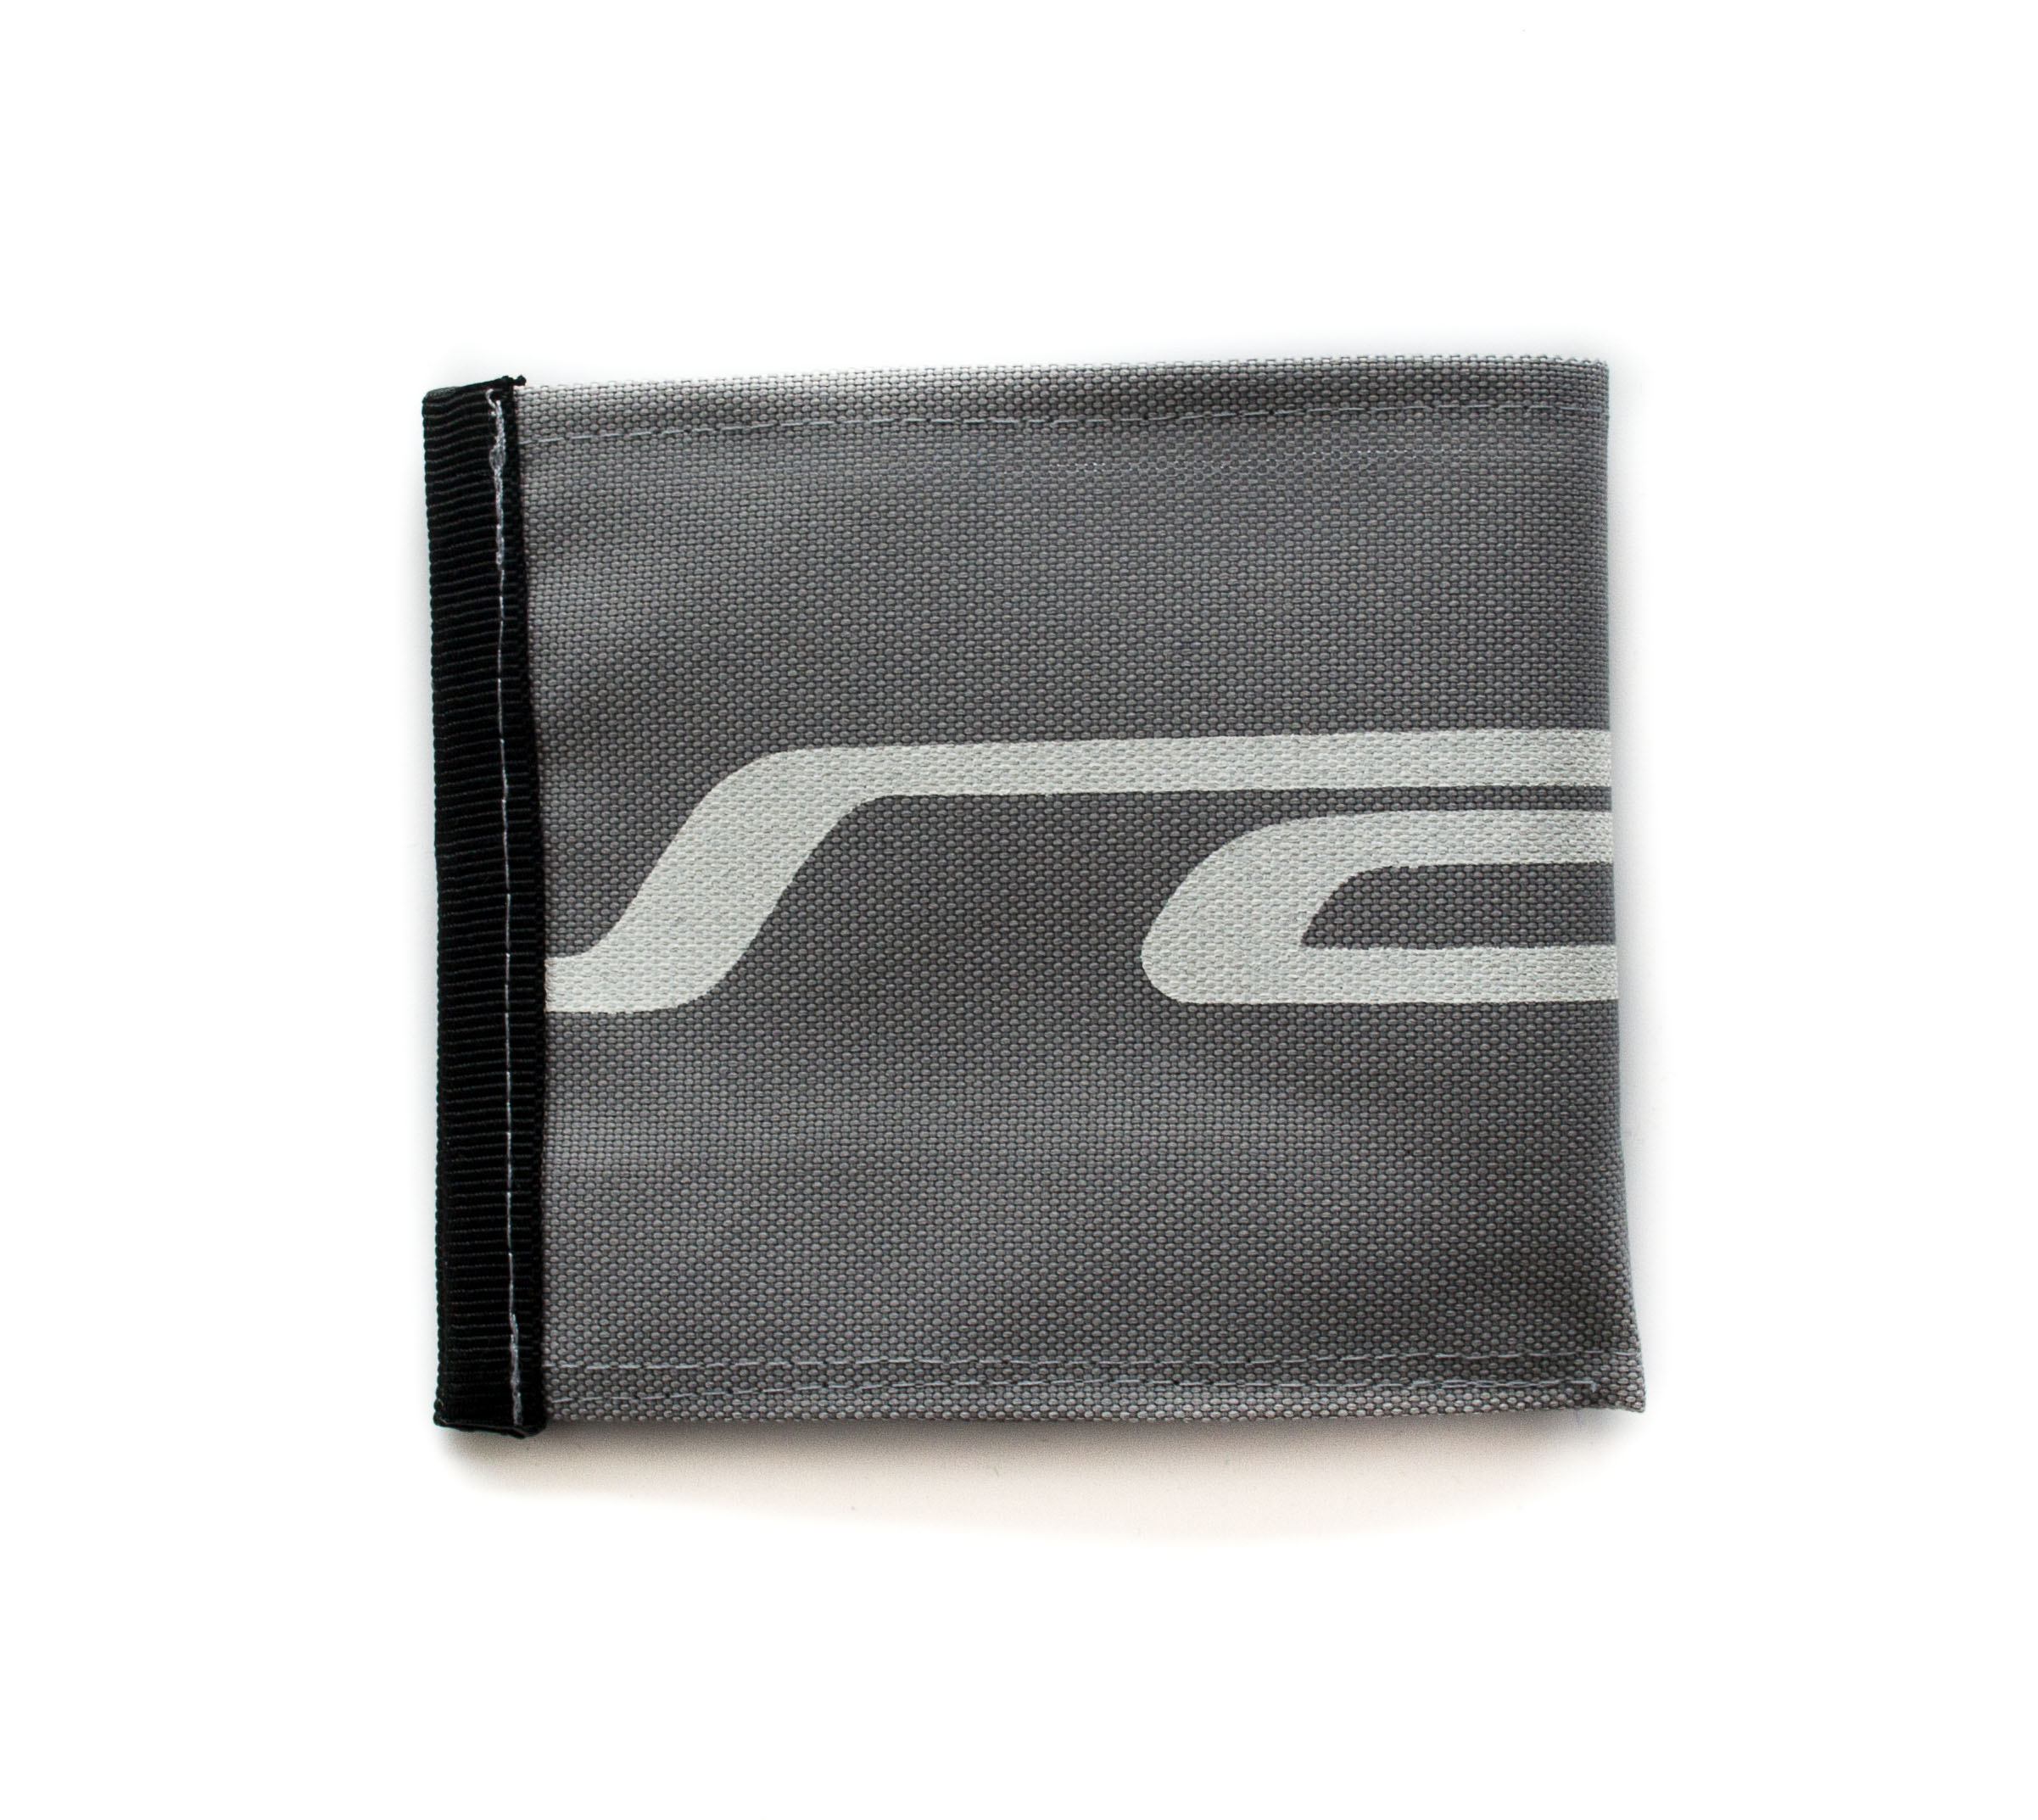 ReSailCle - North Volt 4.2 wallet